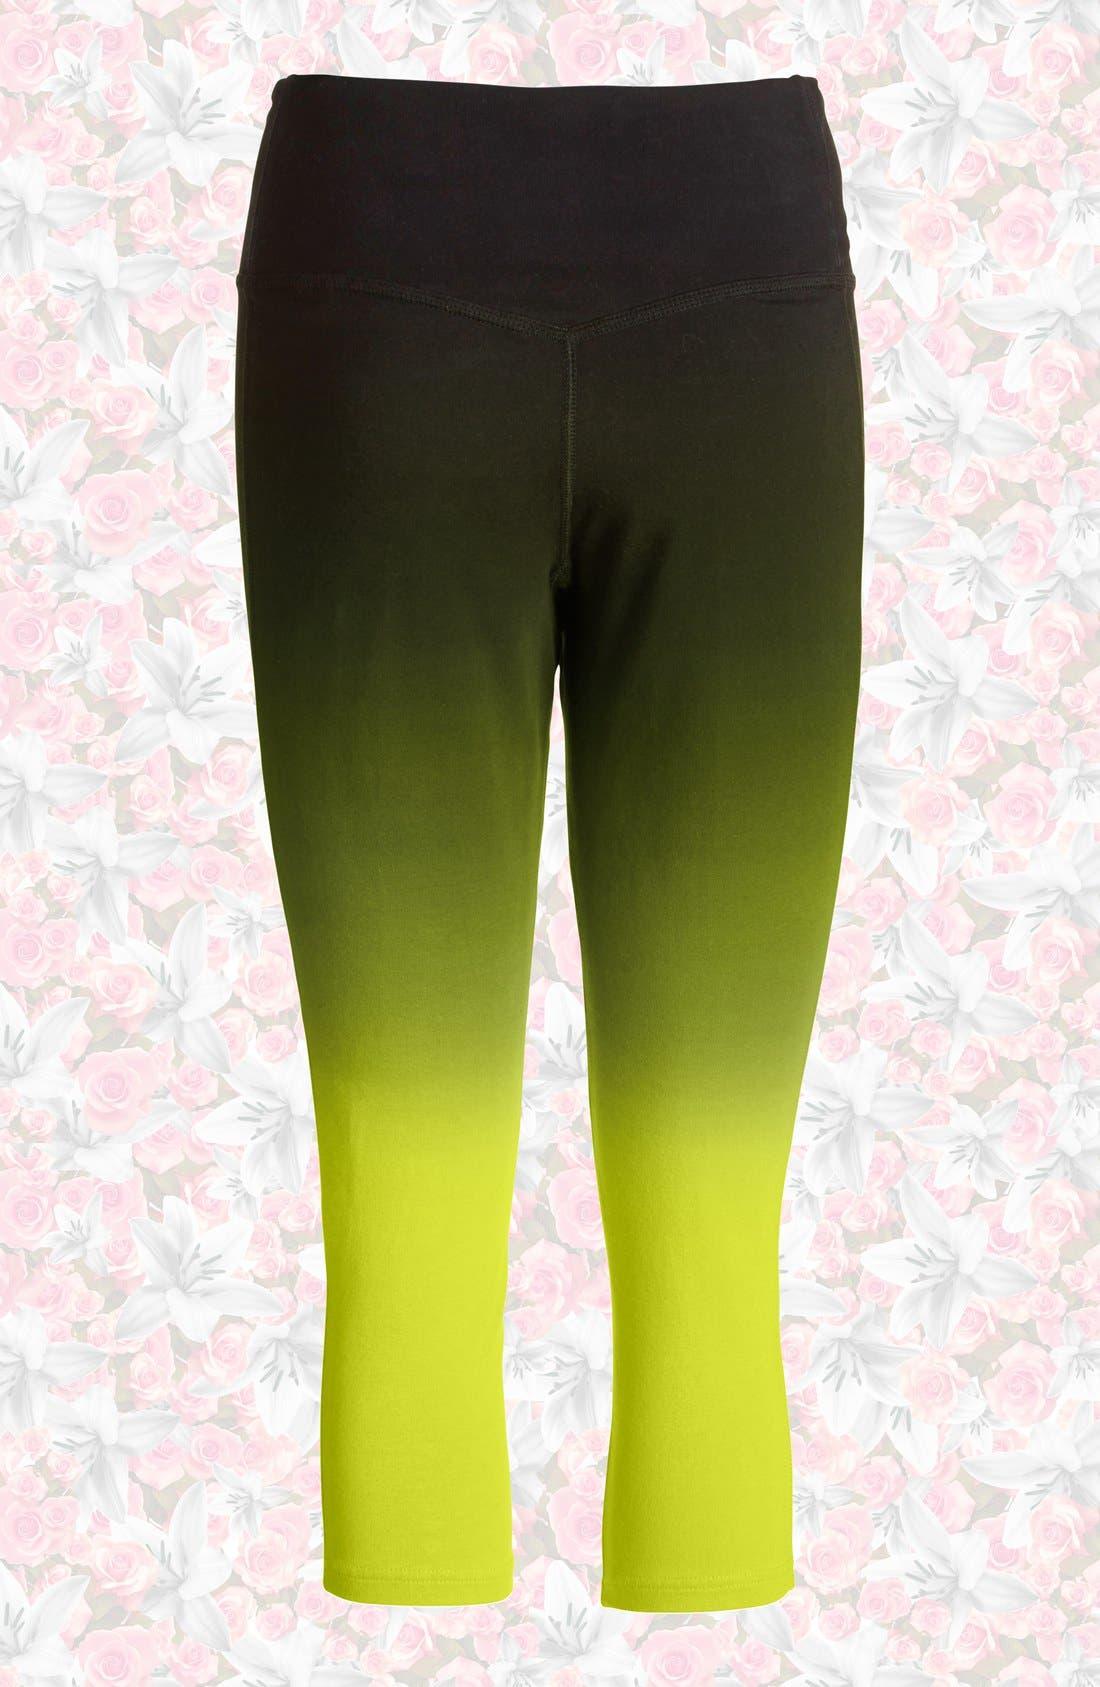 Alternate Image 2  - Nike 'Legend 2.0 Sunset Tight' Dri-FIT Training Capri Leggings (Women)